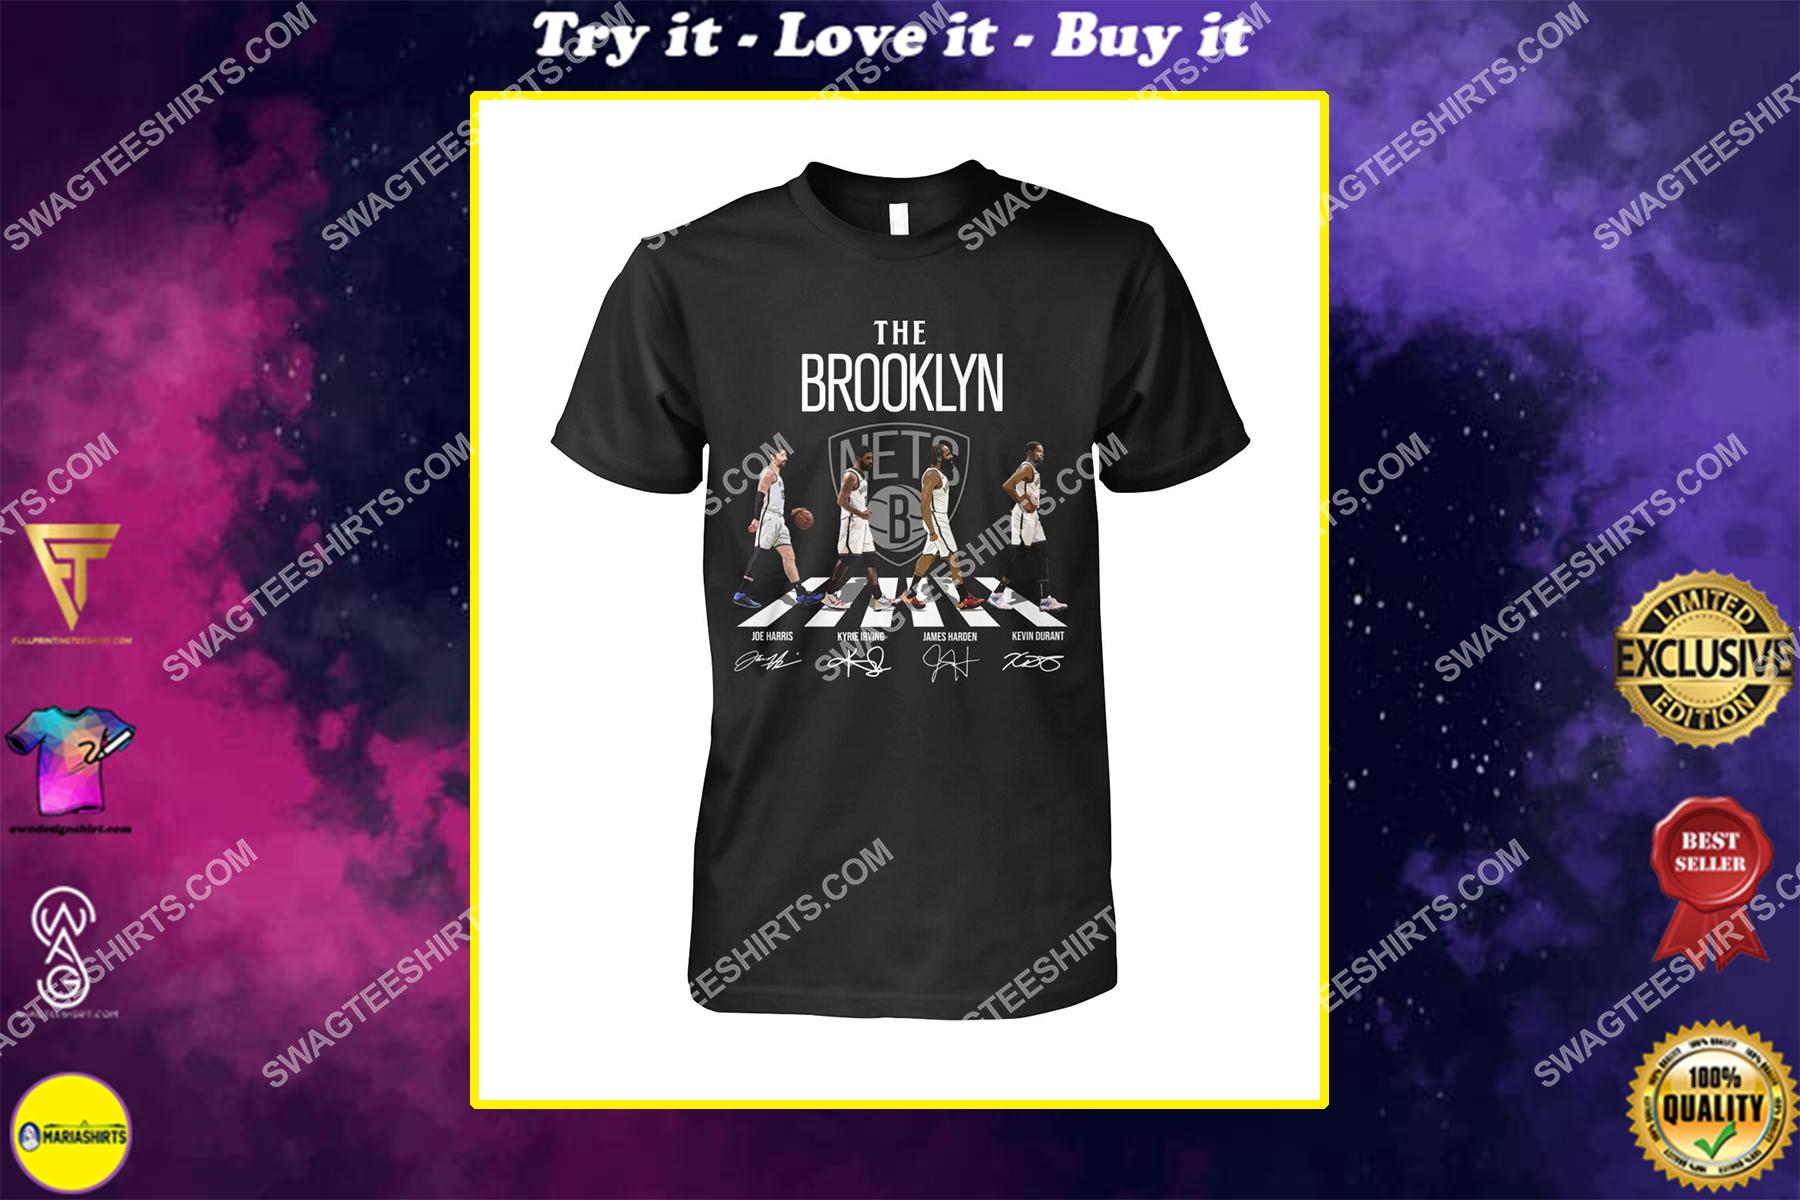 the brooklyn nets walking abbey road signatures shirt